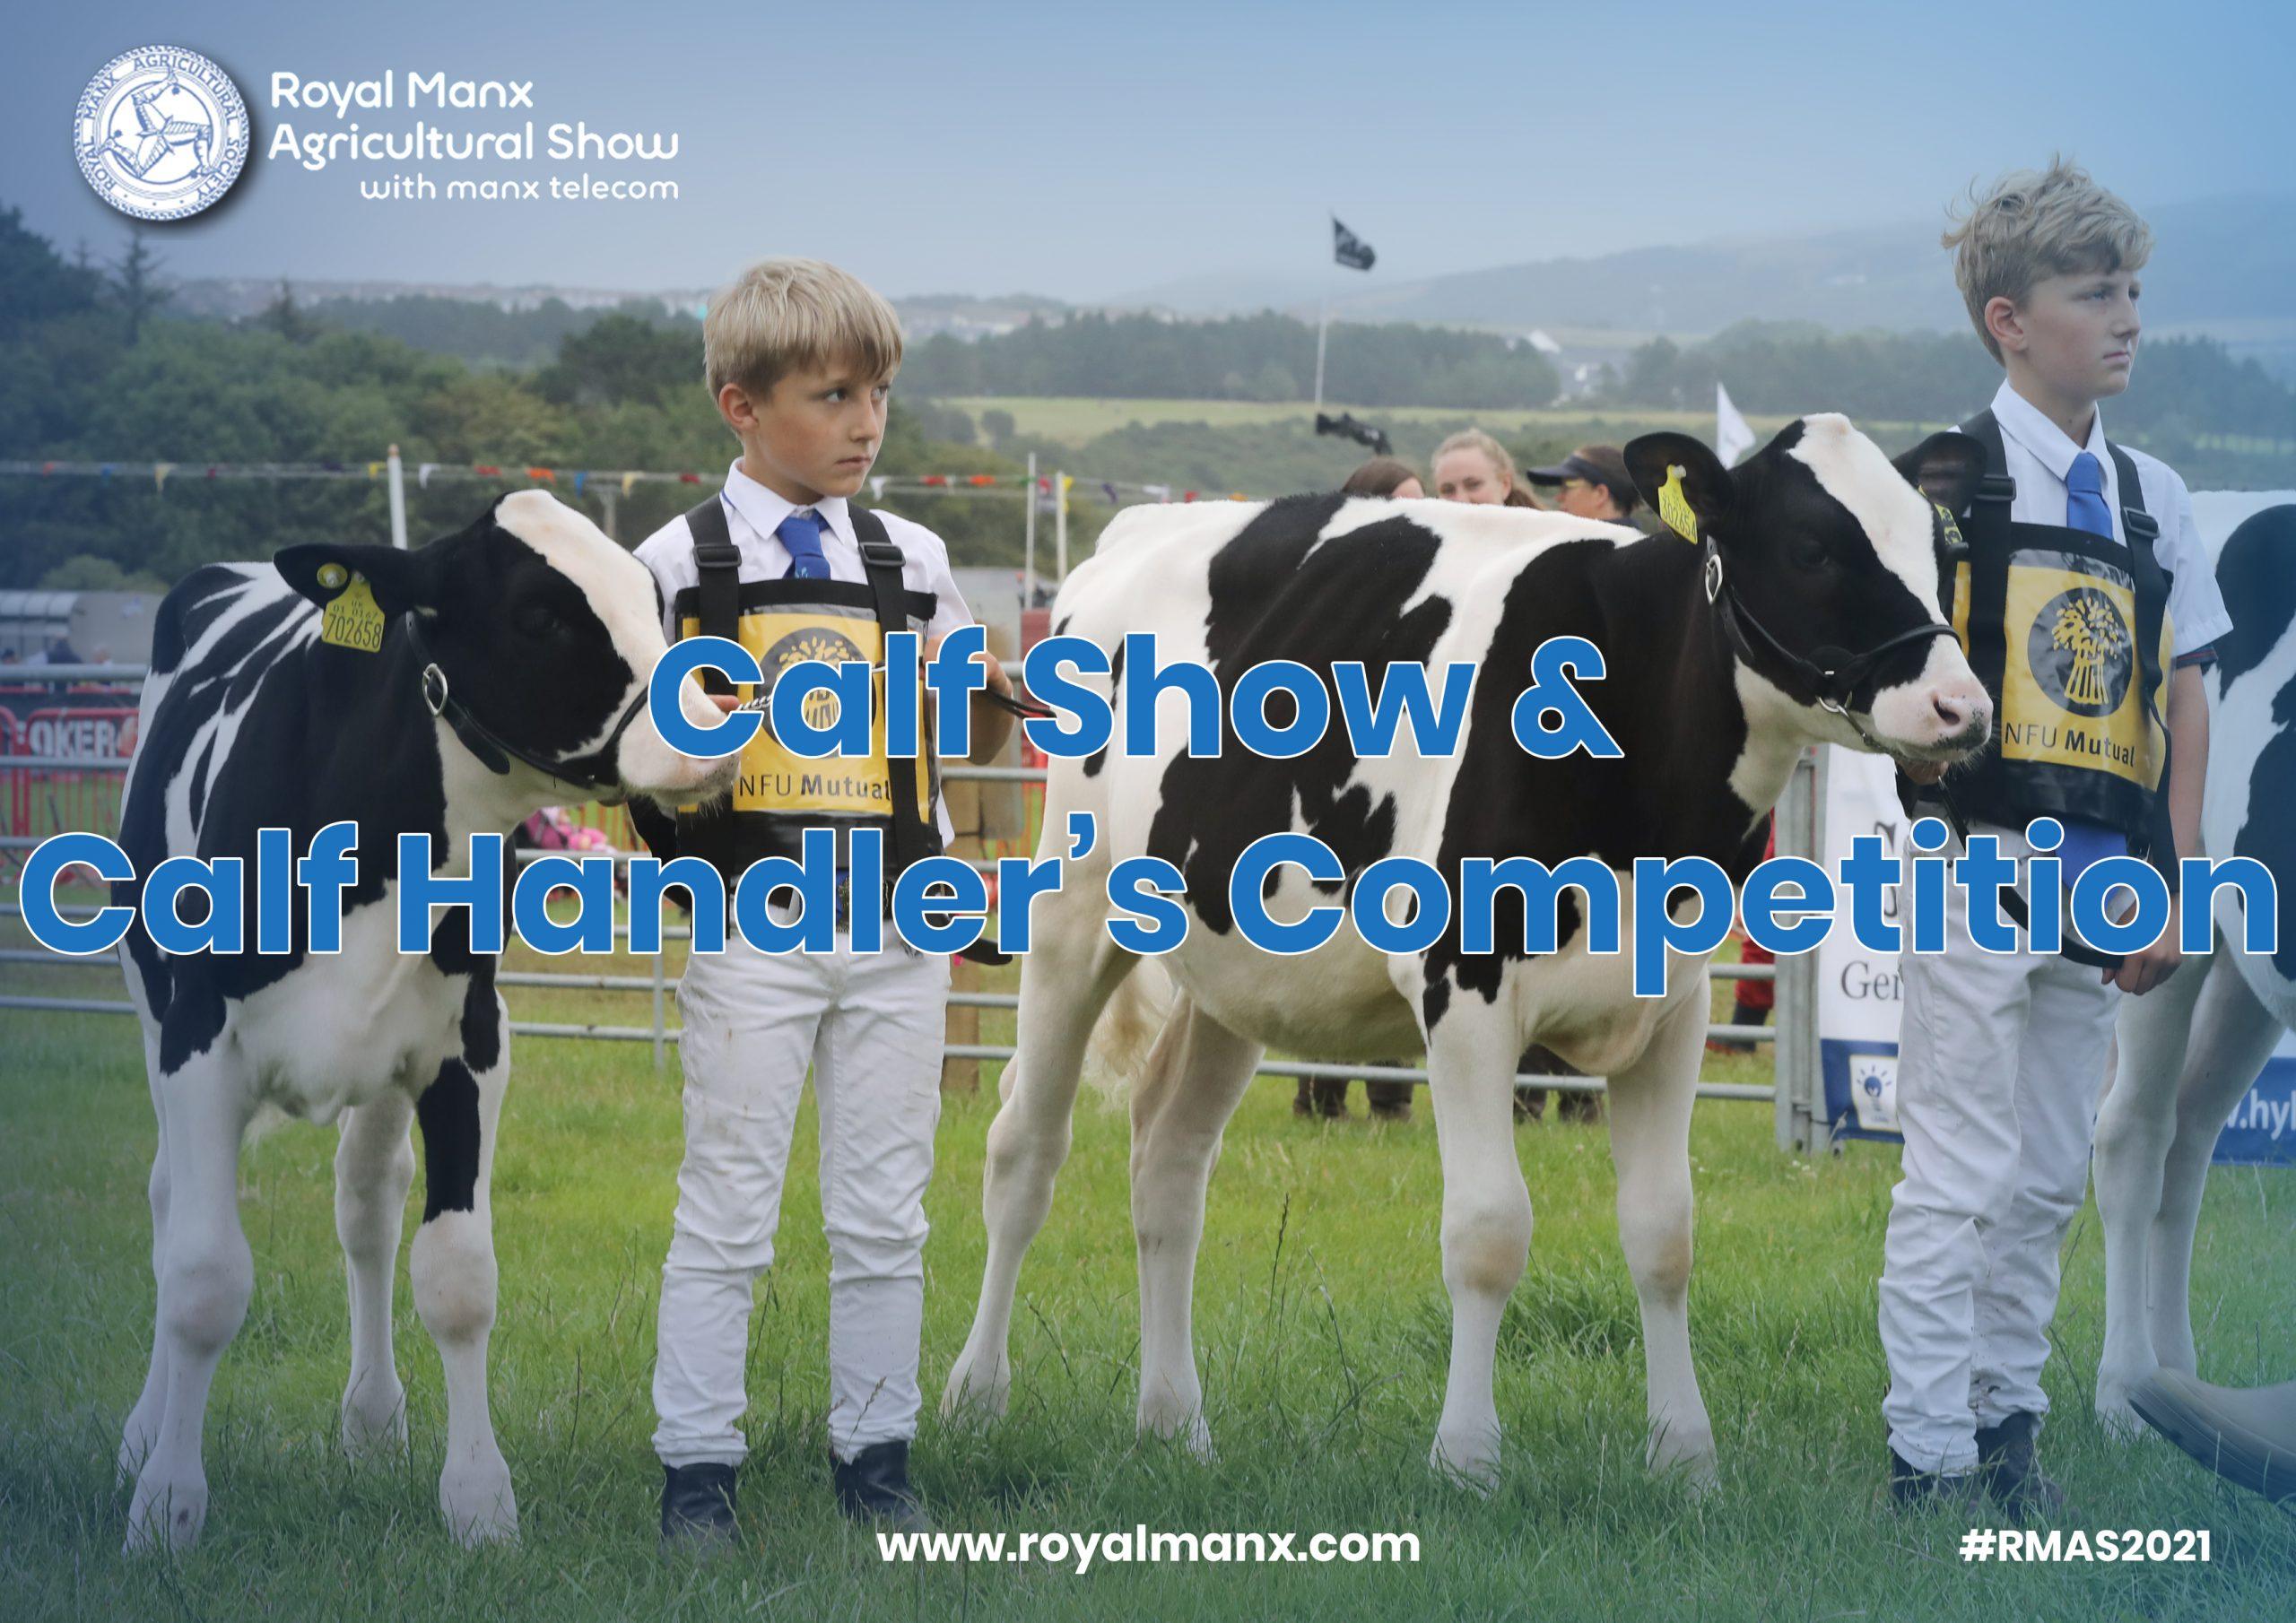 Livestock & Marquee Judging